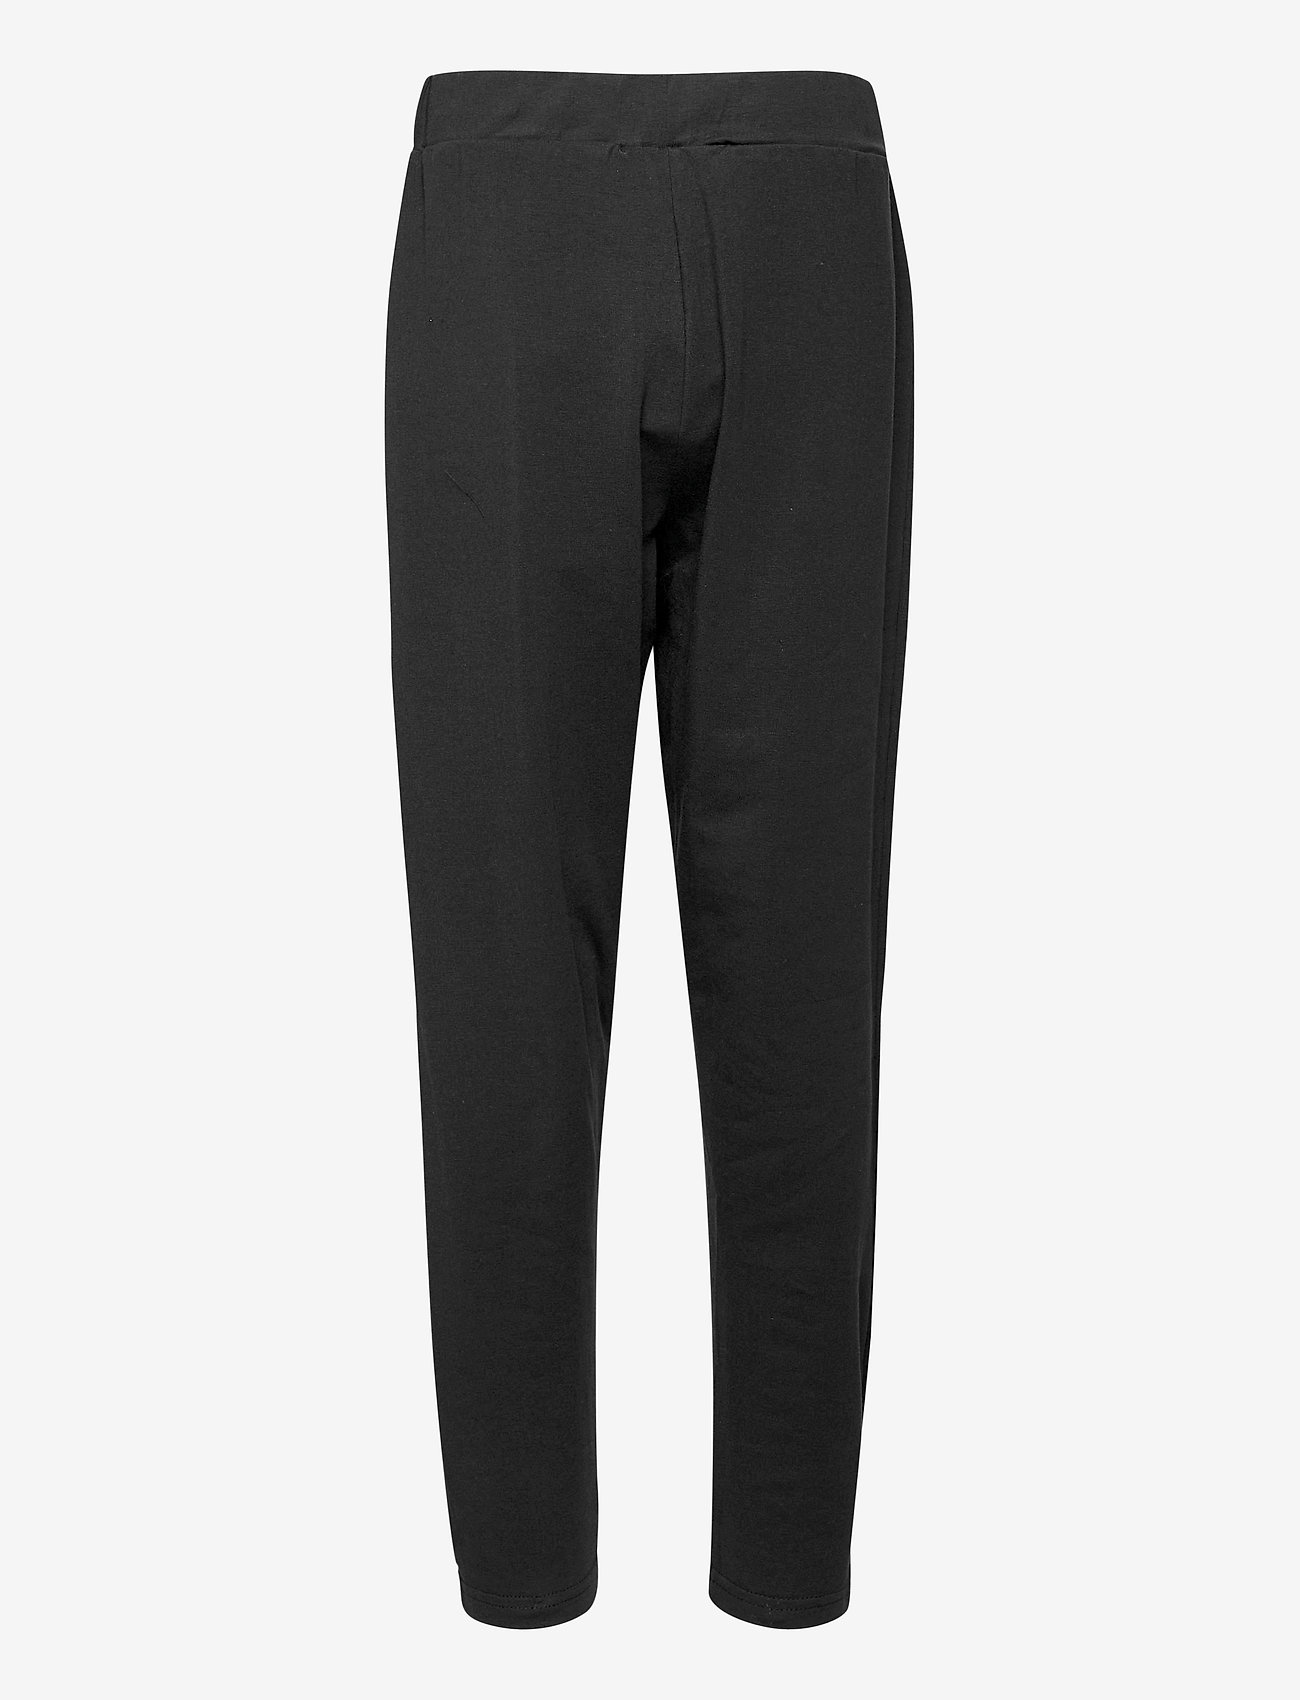 Hummel - hmlANDREA PANTS - trousers - black - 1